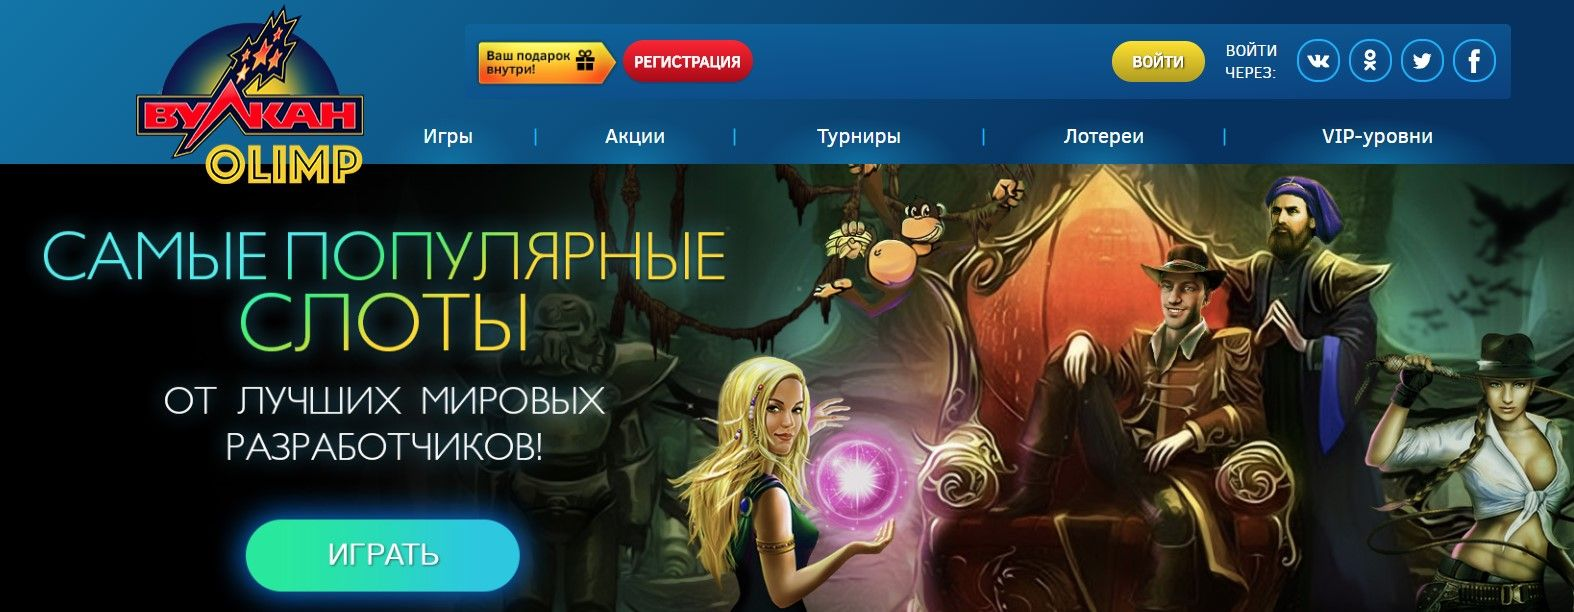 сайт казино вулкан олимп